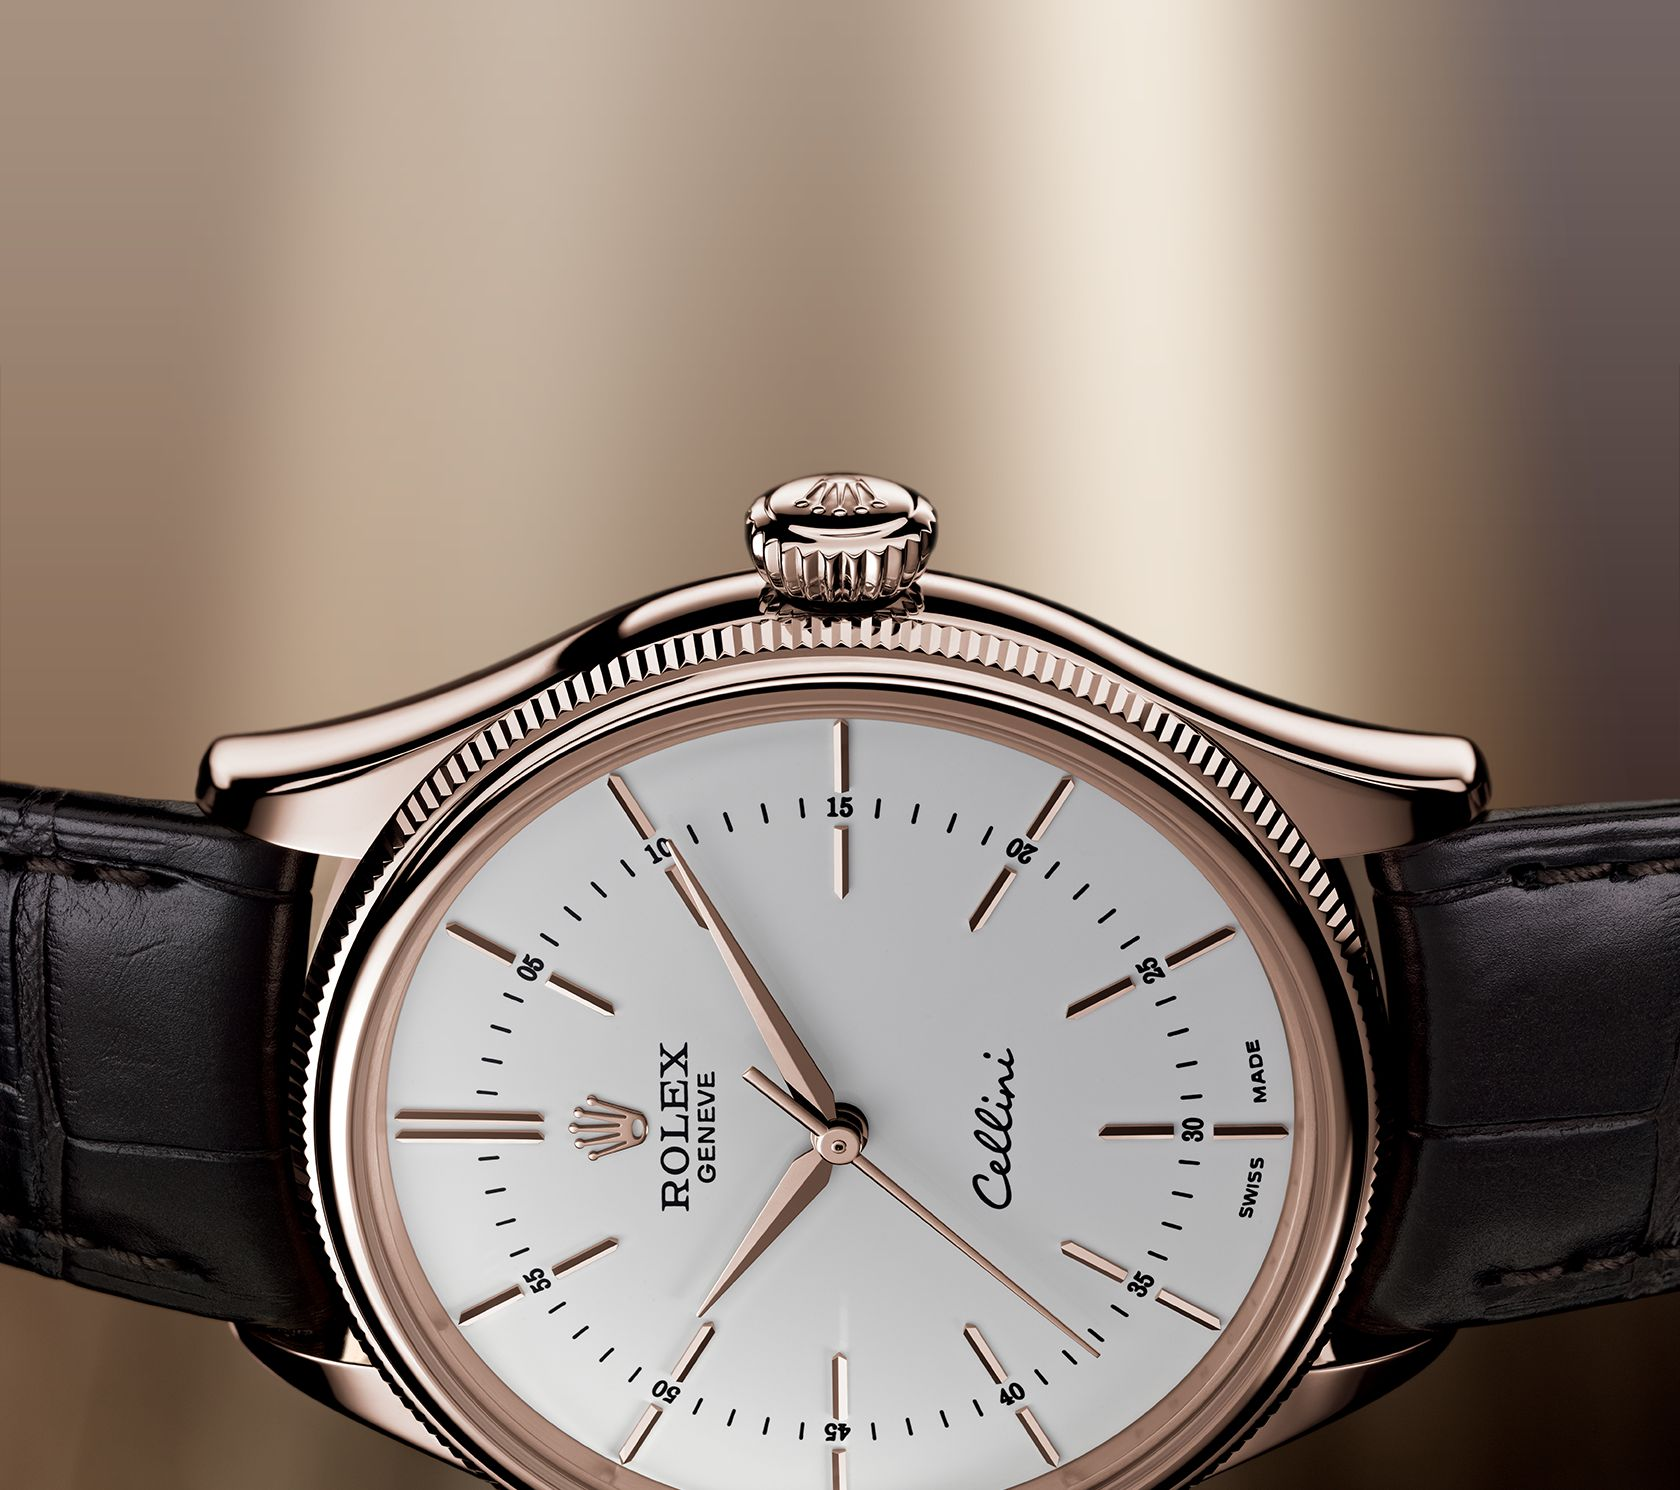 Everose Gold Hands Rolex Cellini Time Replica Watches